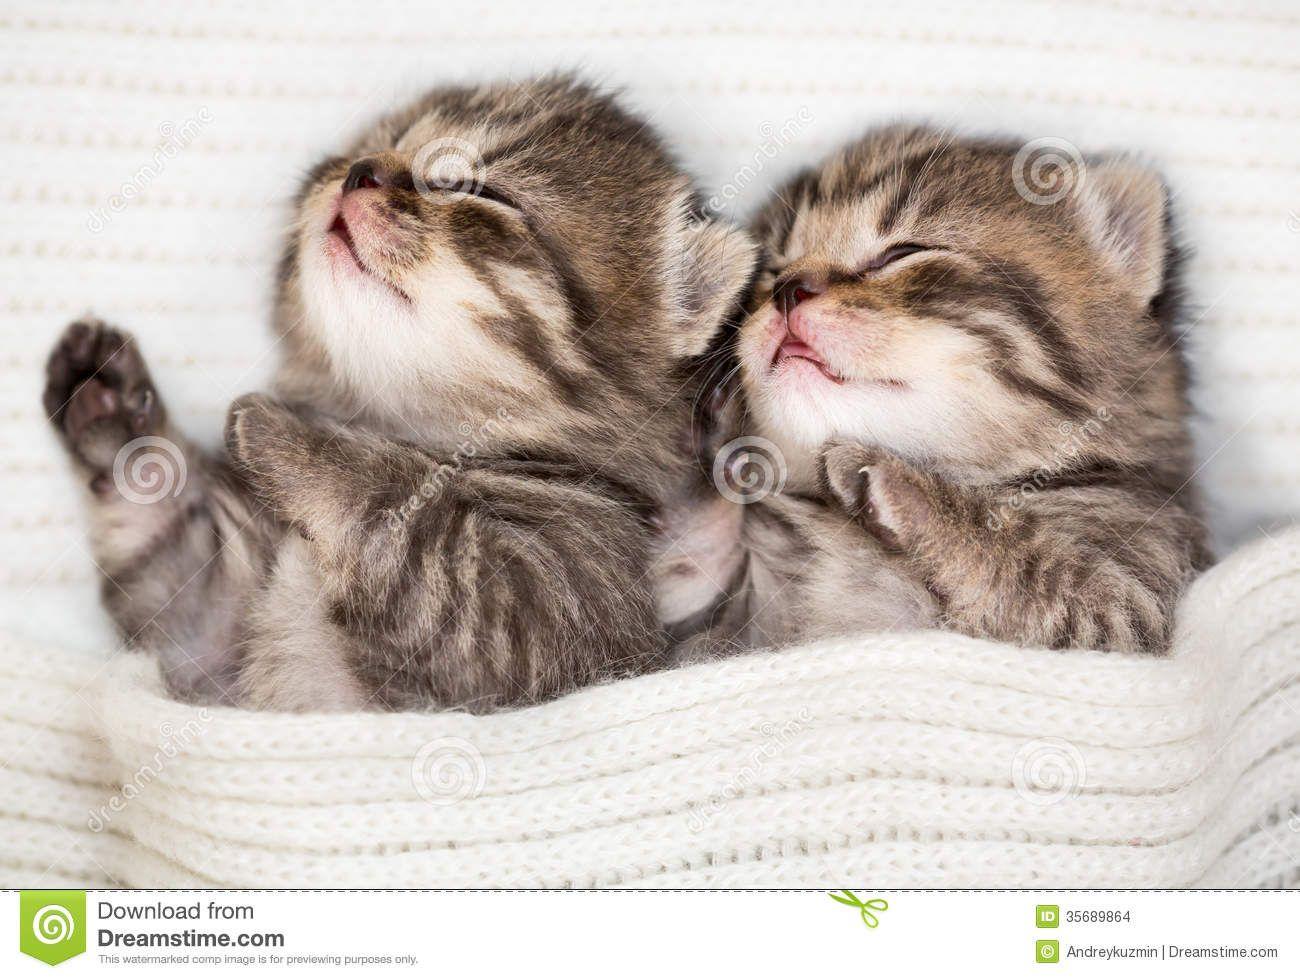 Cute Baby Kittens Sleeping Two Sleeping Baby Kitten Lying